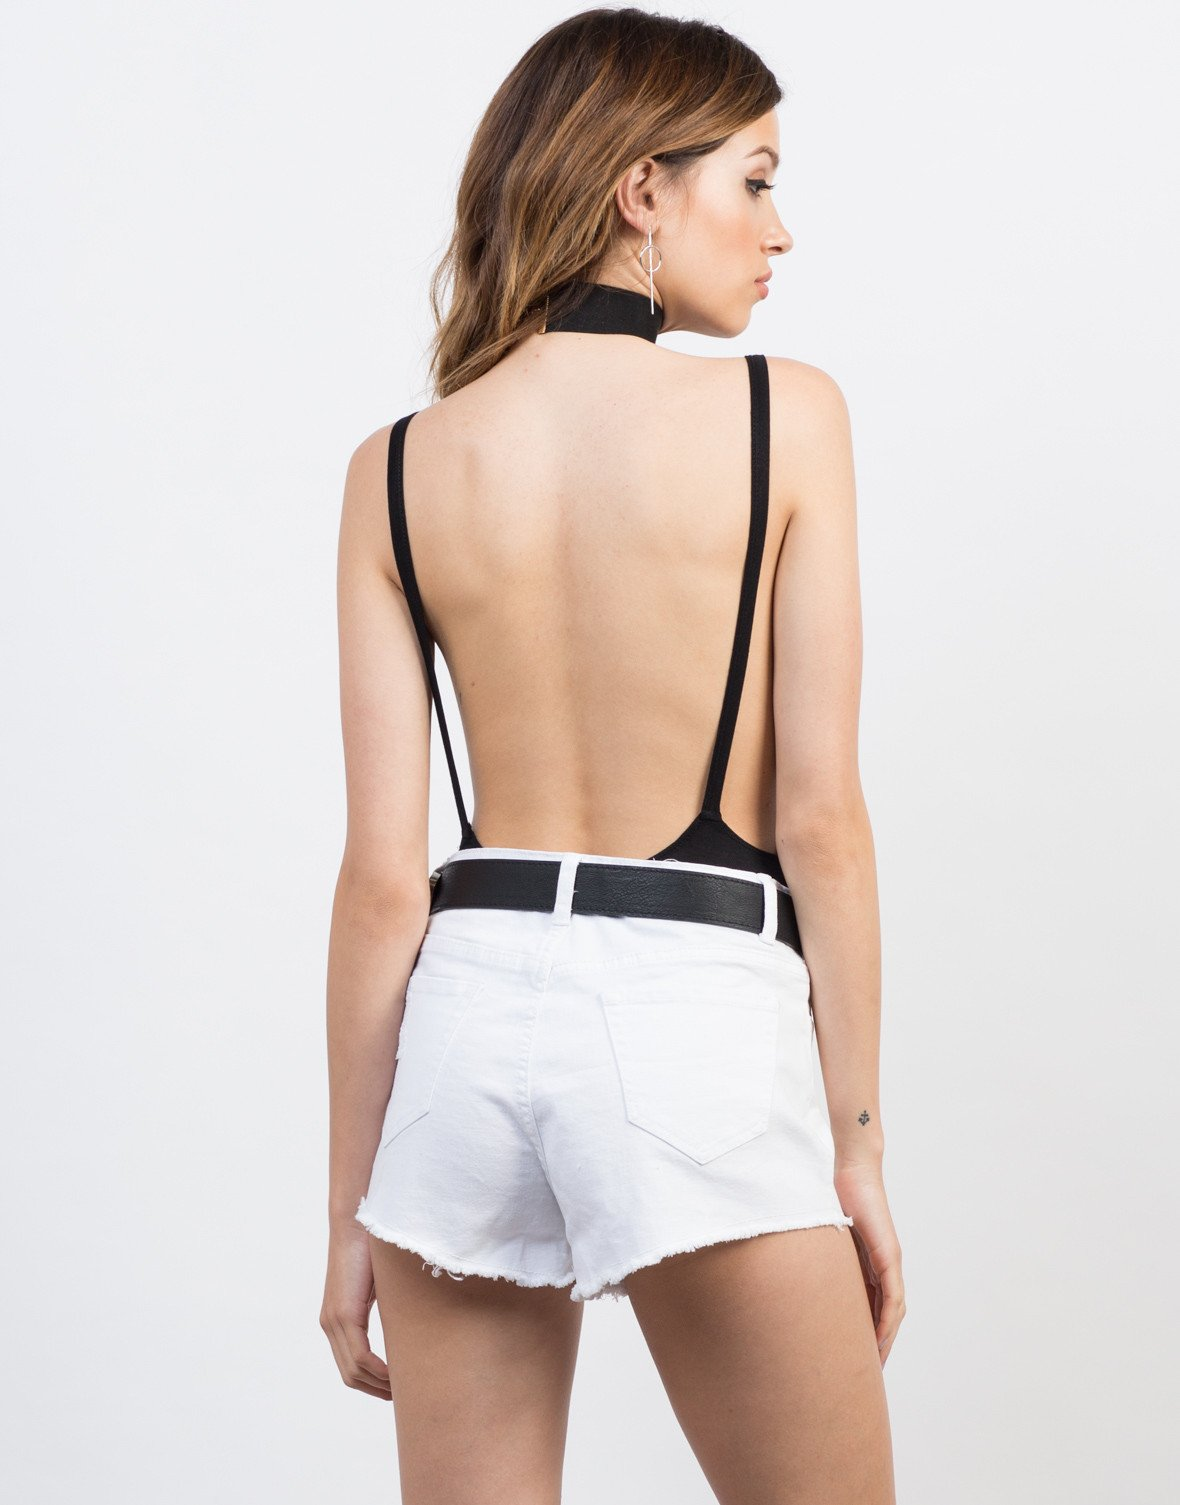 Fashion Bodysuits for Women | Thong Bodysuit | Strappy Bodysuit